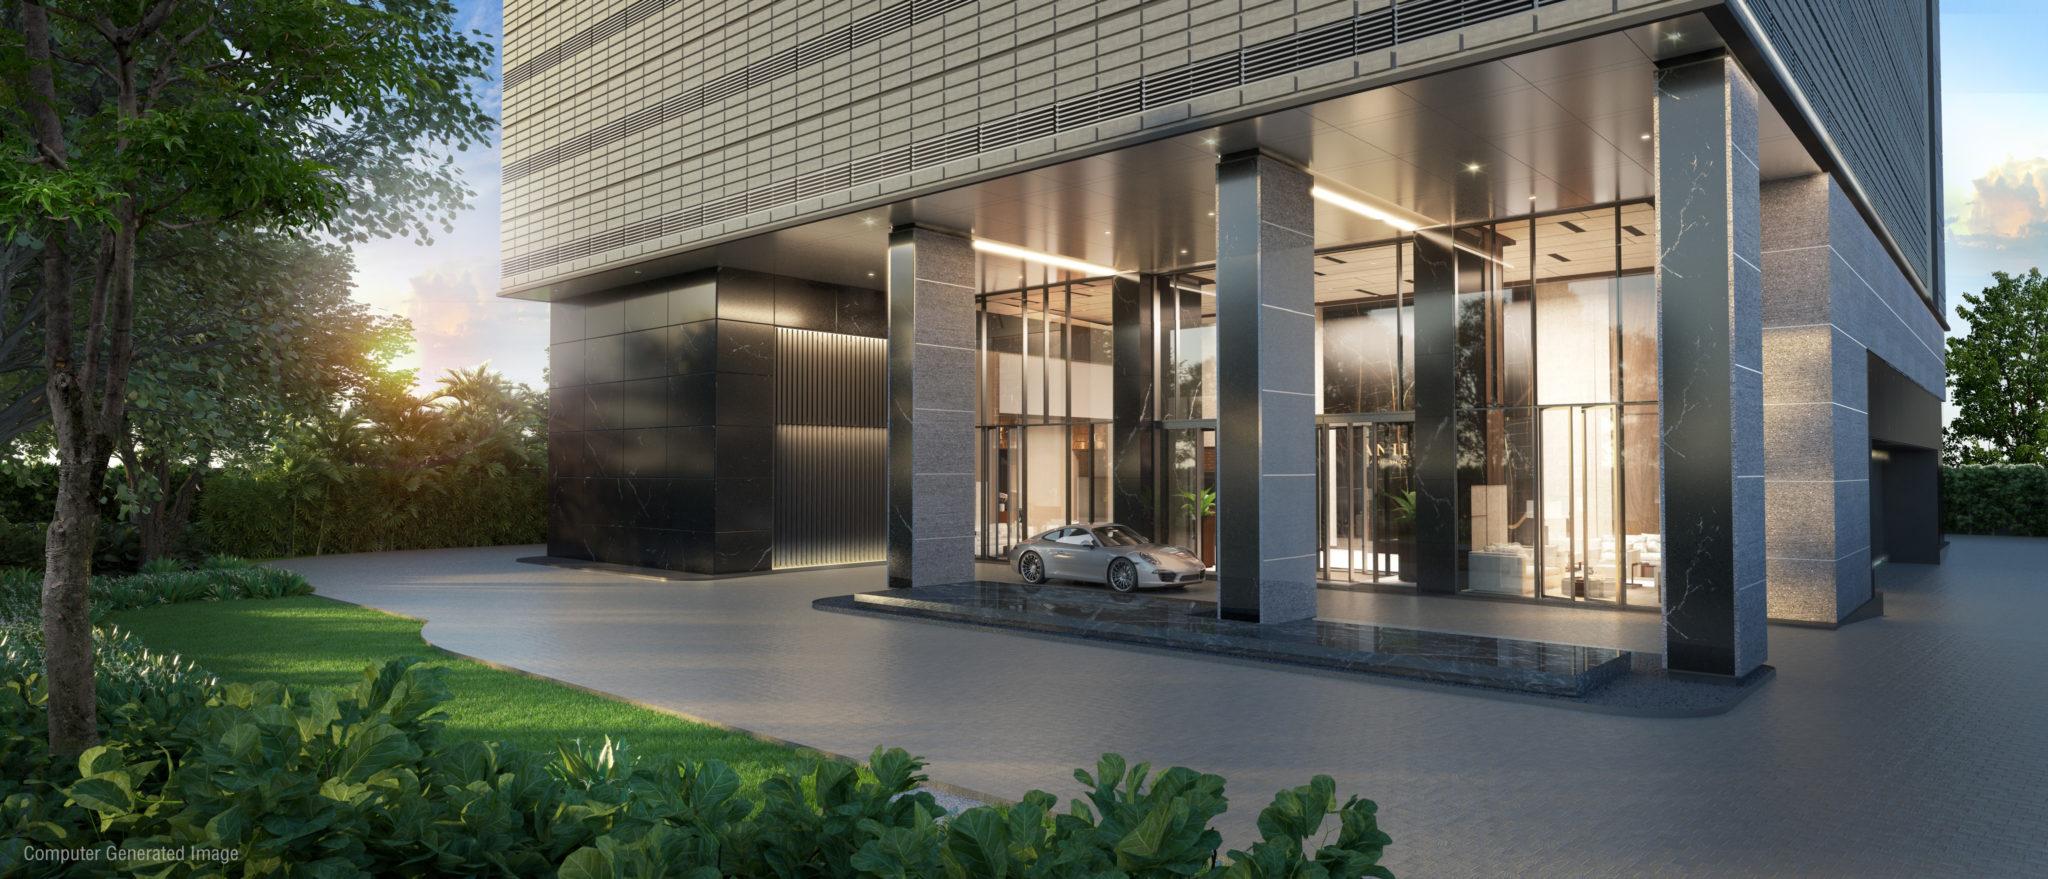 ANIL Sathorn 12 คอนโดสาทรสุดหรูที่ยกระดับคุณภาพชีวิตของผู้พักอาศัย ด้วยมาตรฐาน WELL Building Standard 20 - GRAND UNITY